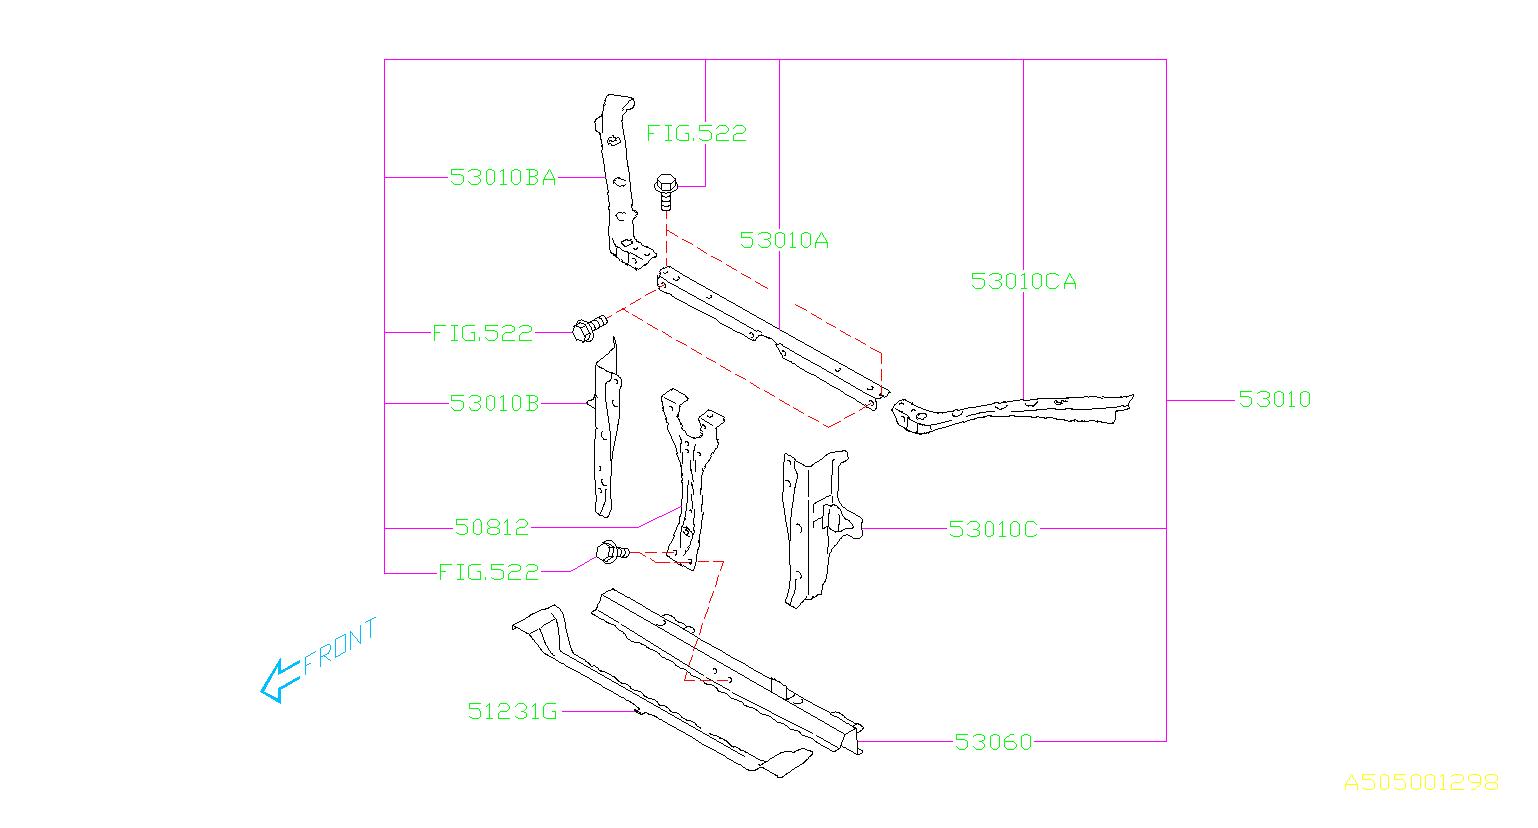 subaru forester parts diagram honda wiring harness 2016 frame complete radiator lower panel